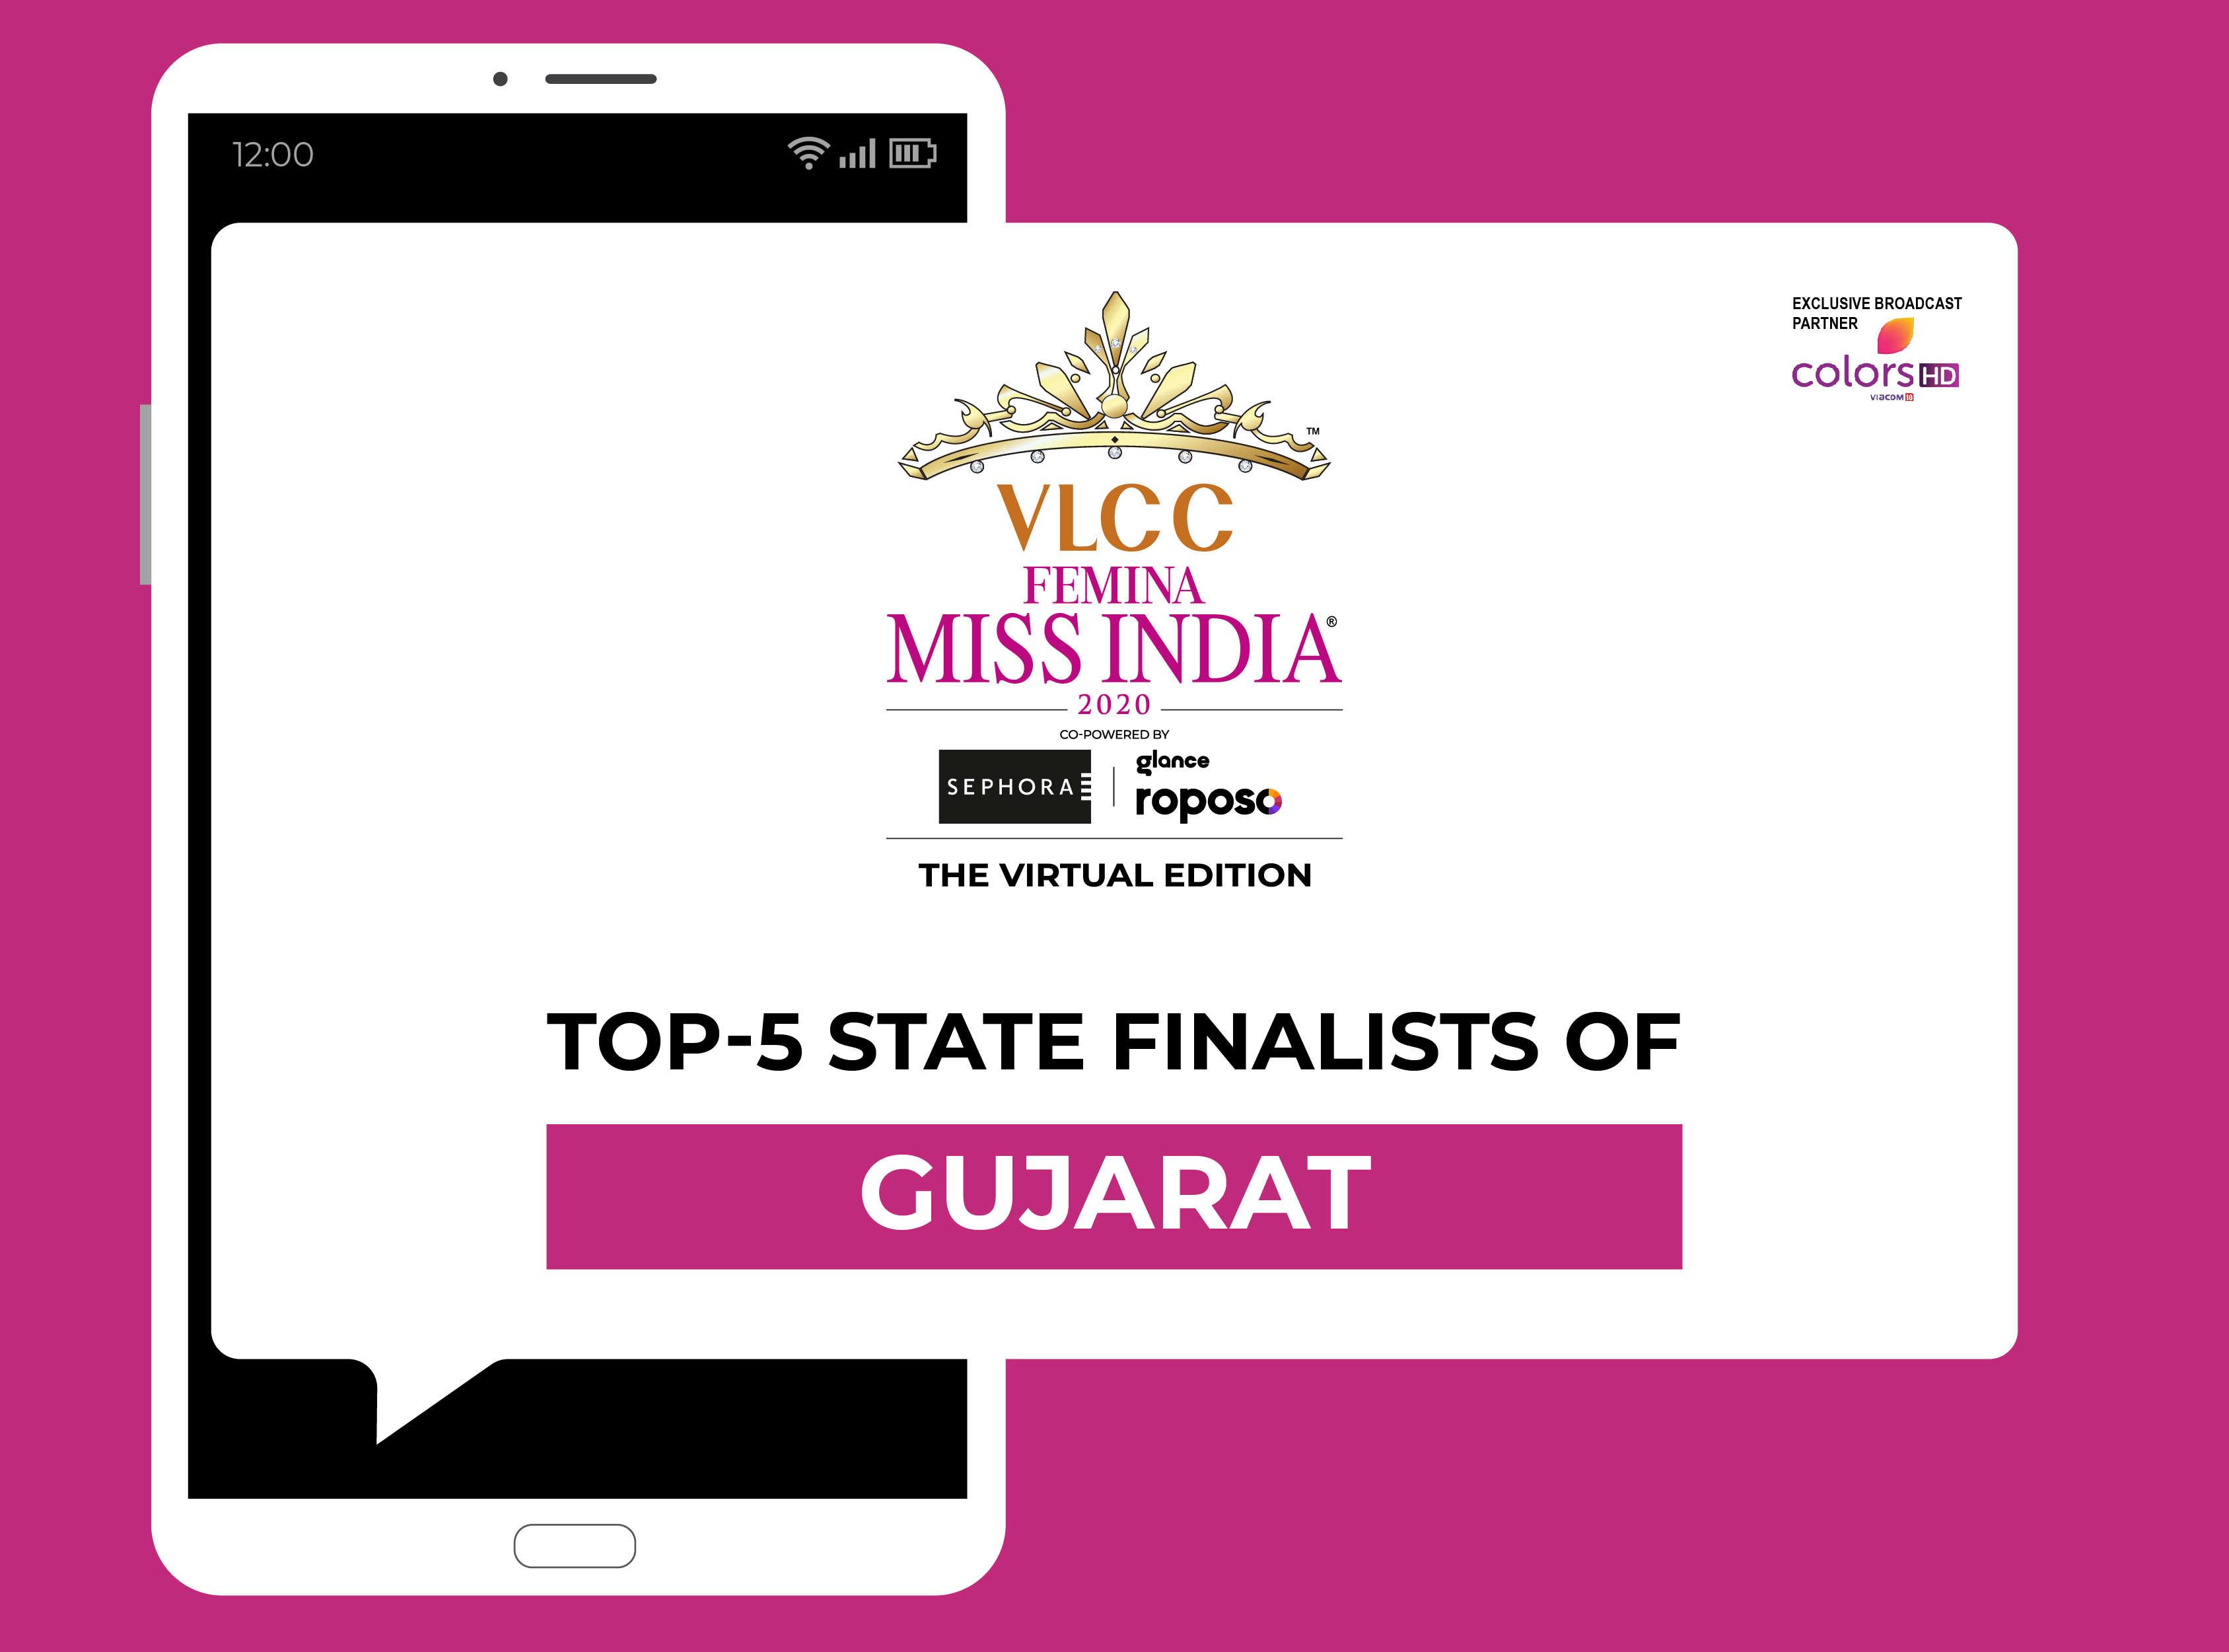 Introducing VLCC Femina Miss India Gujarat 2020 Finalists!